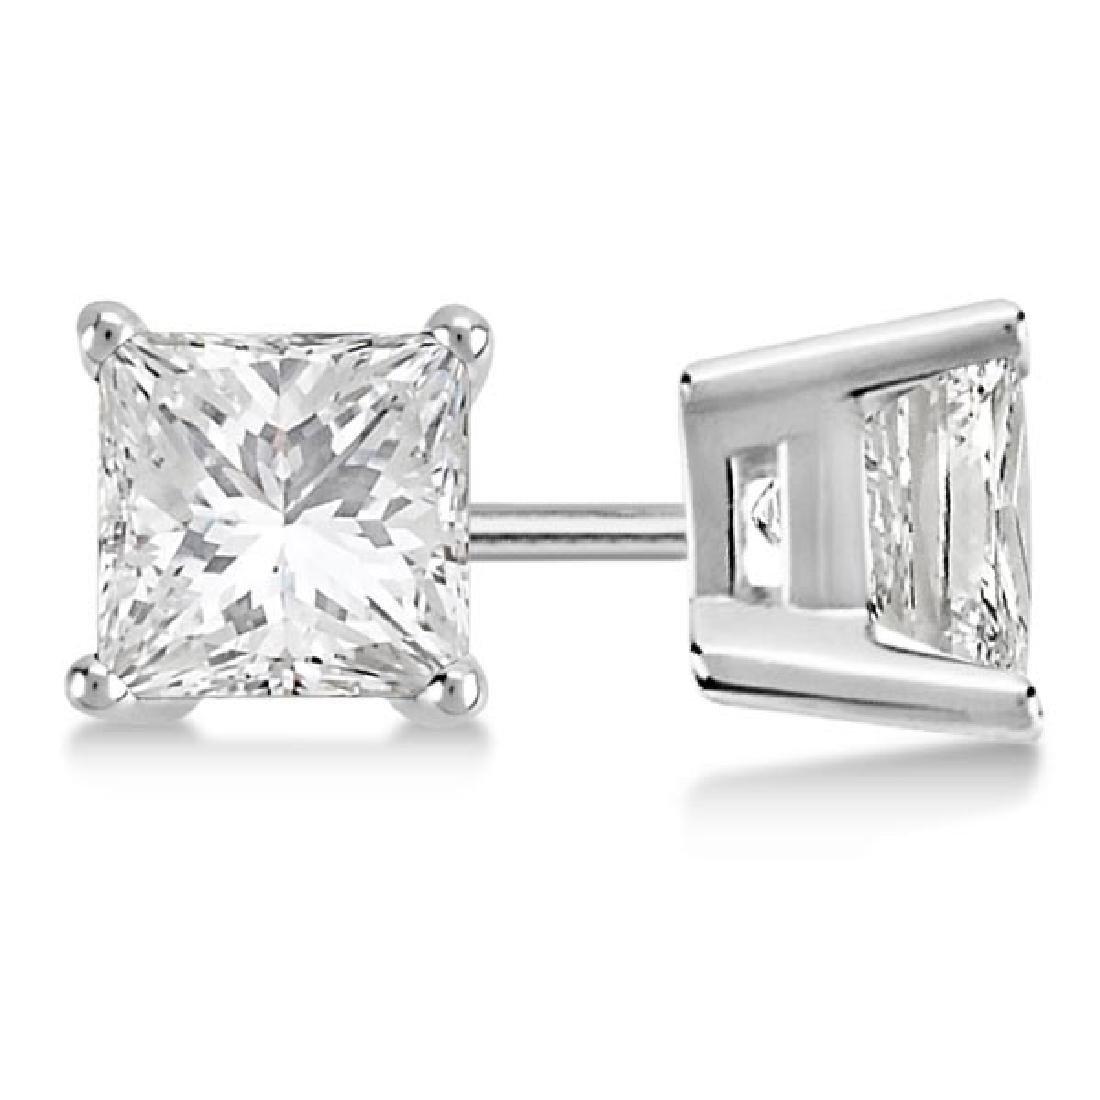 Certified 1.11 CTW Princess Diamond Stud Earrings D/SI2